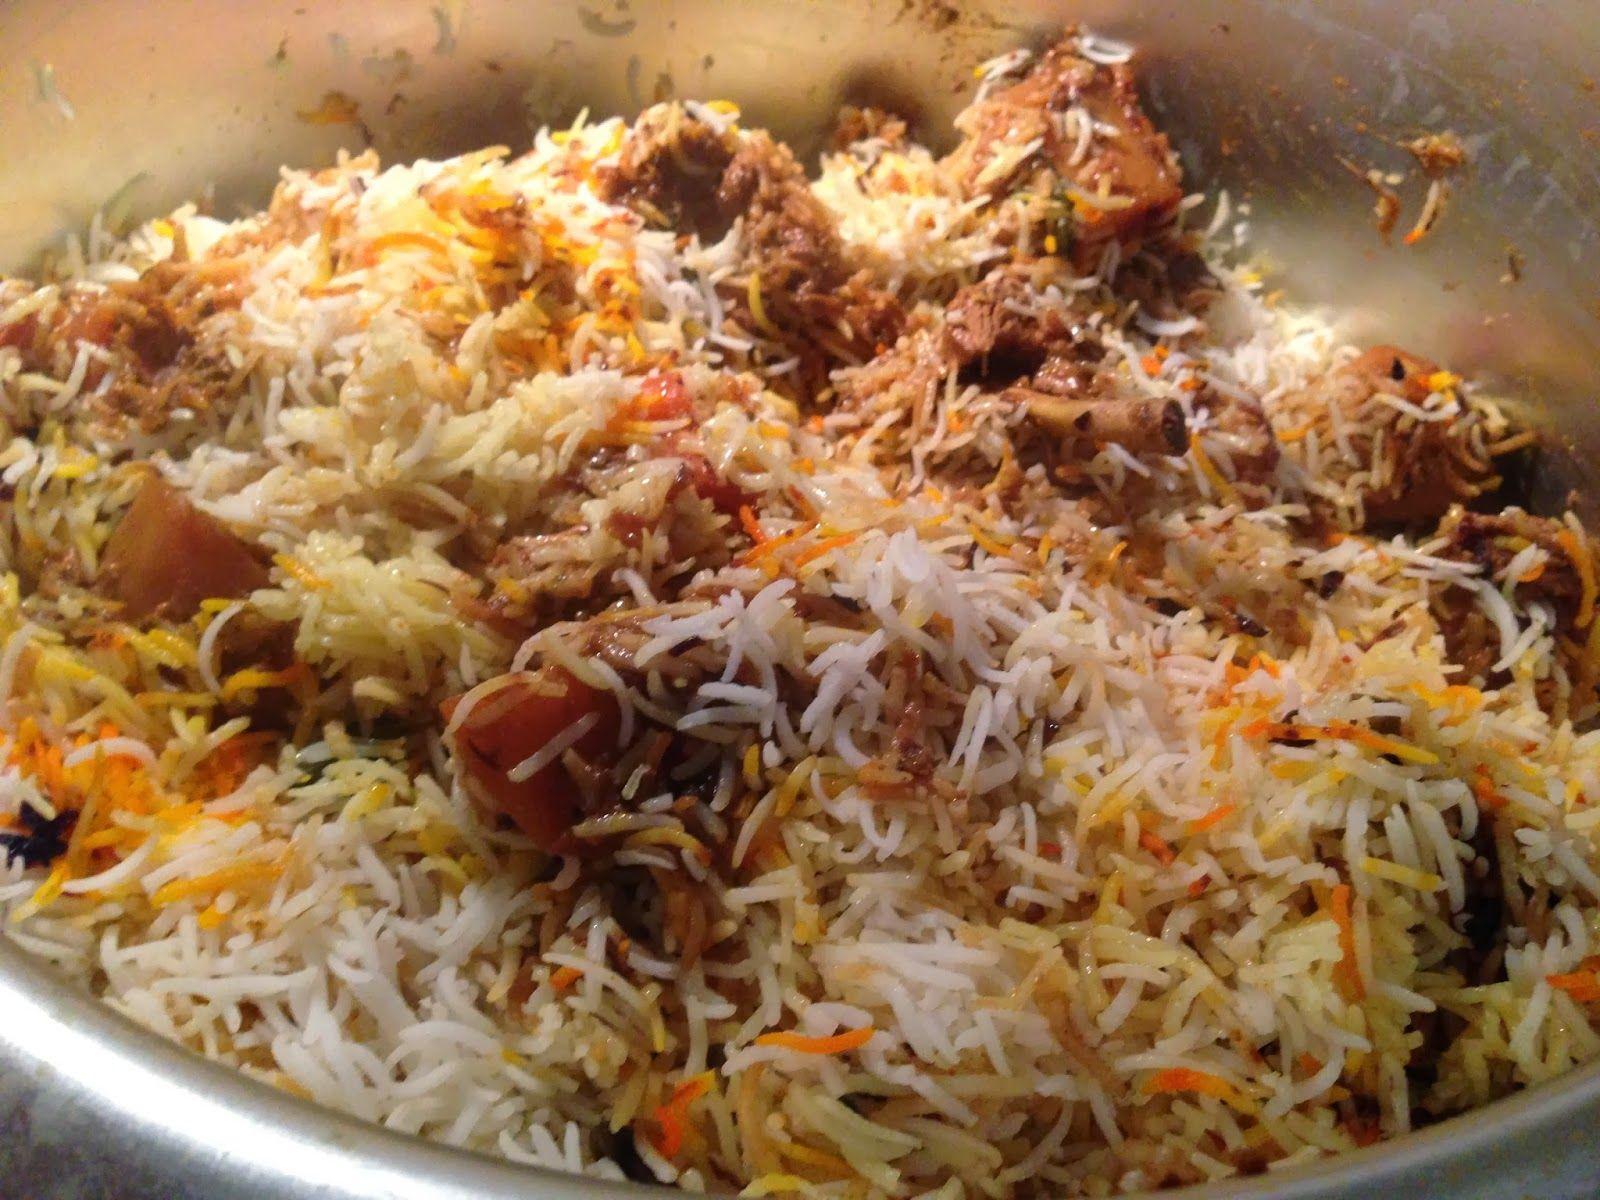 pakistani chicken biryani recipe video - HD1600×1200